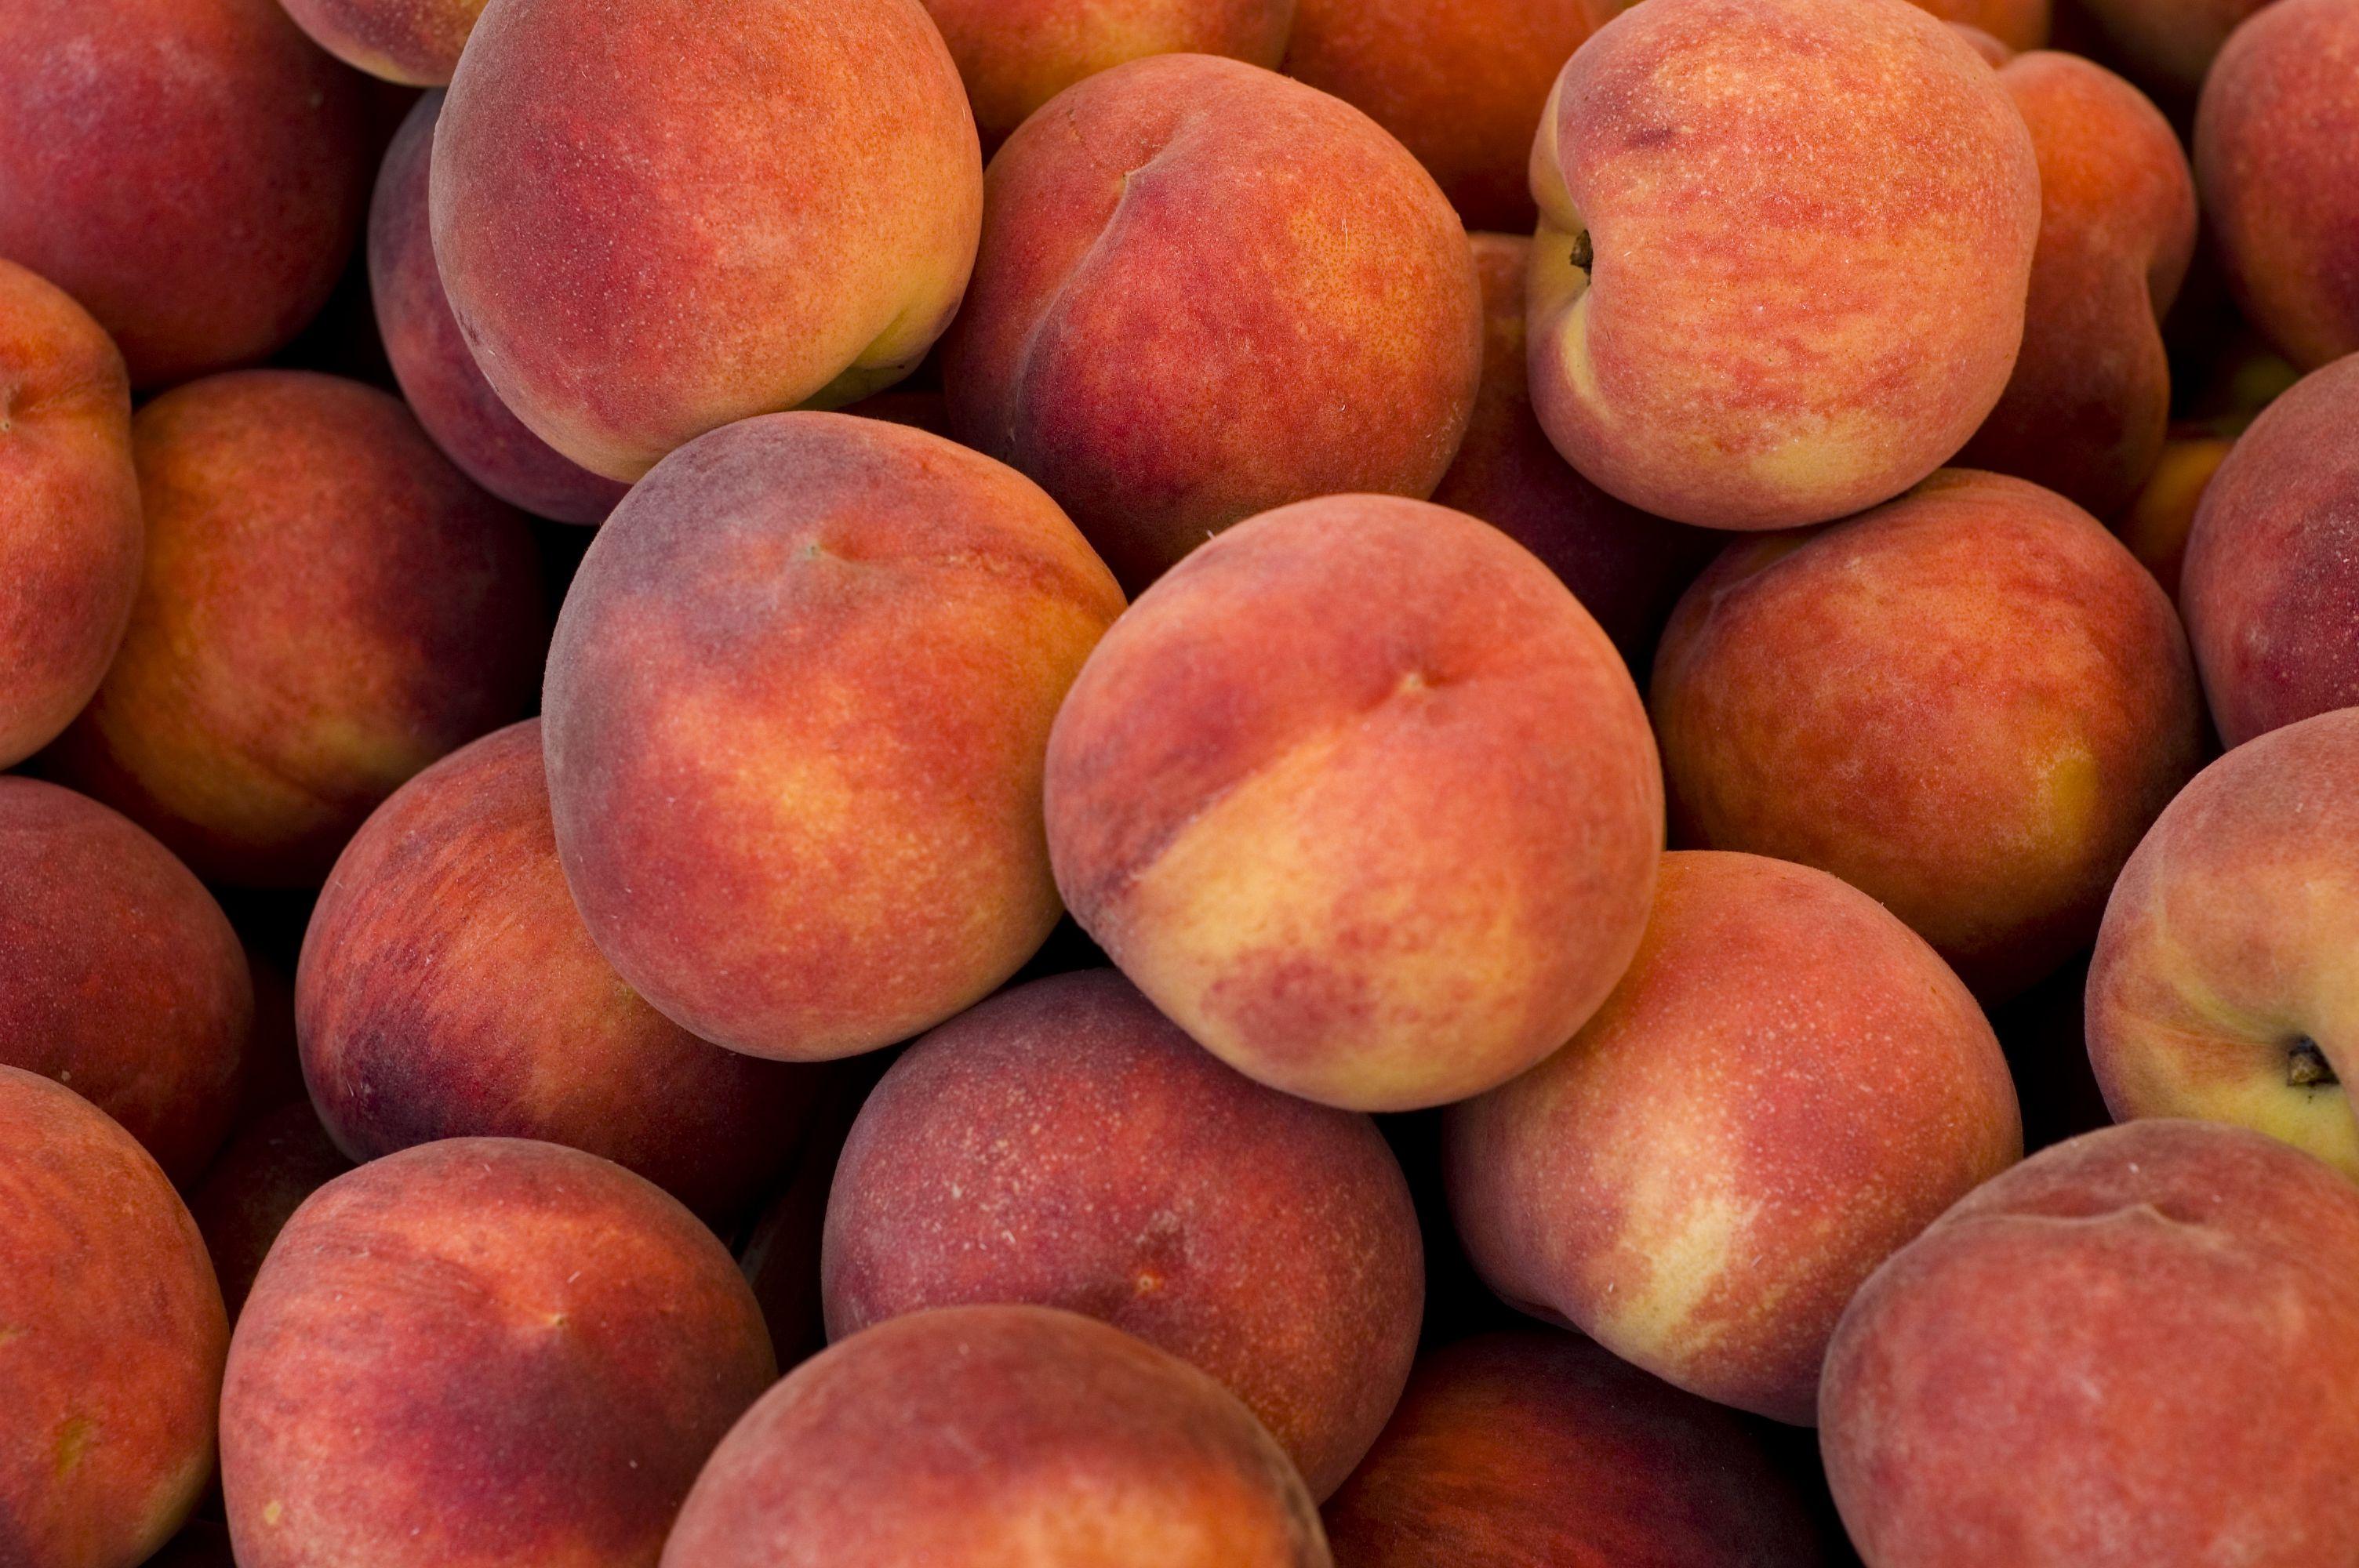 How To Ripen Peaches Perfectly Every Time How To Ripen Fruit,Kielbasa Sausage Recipe Ideas